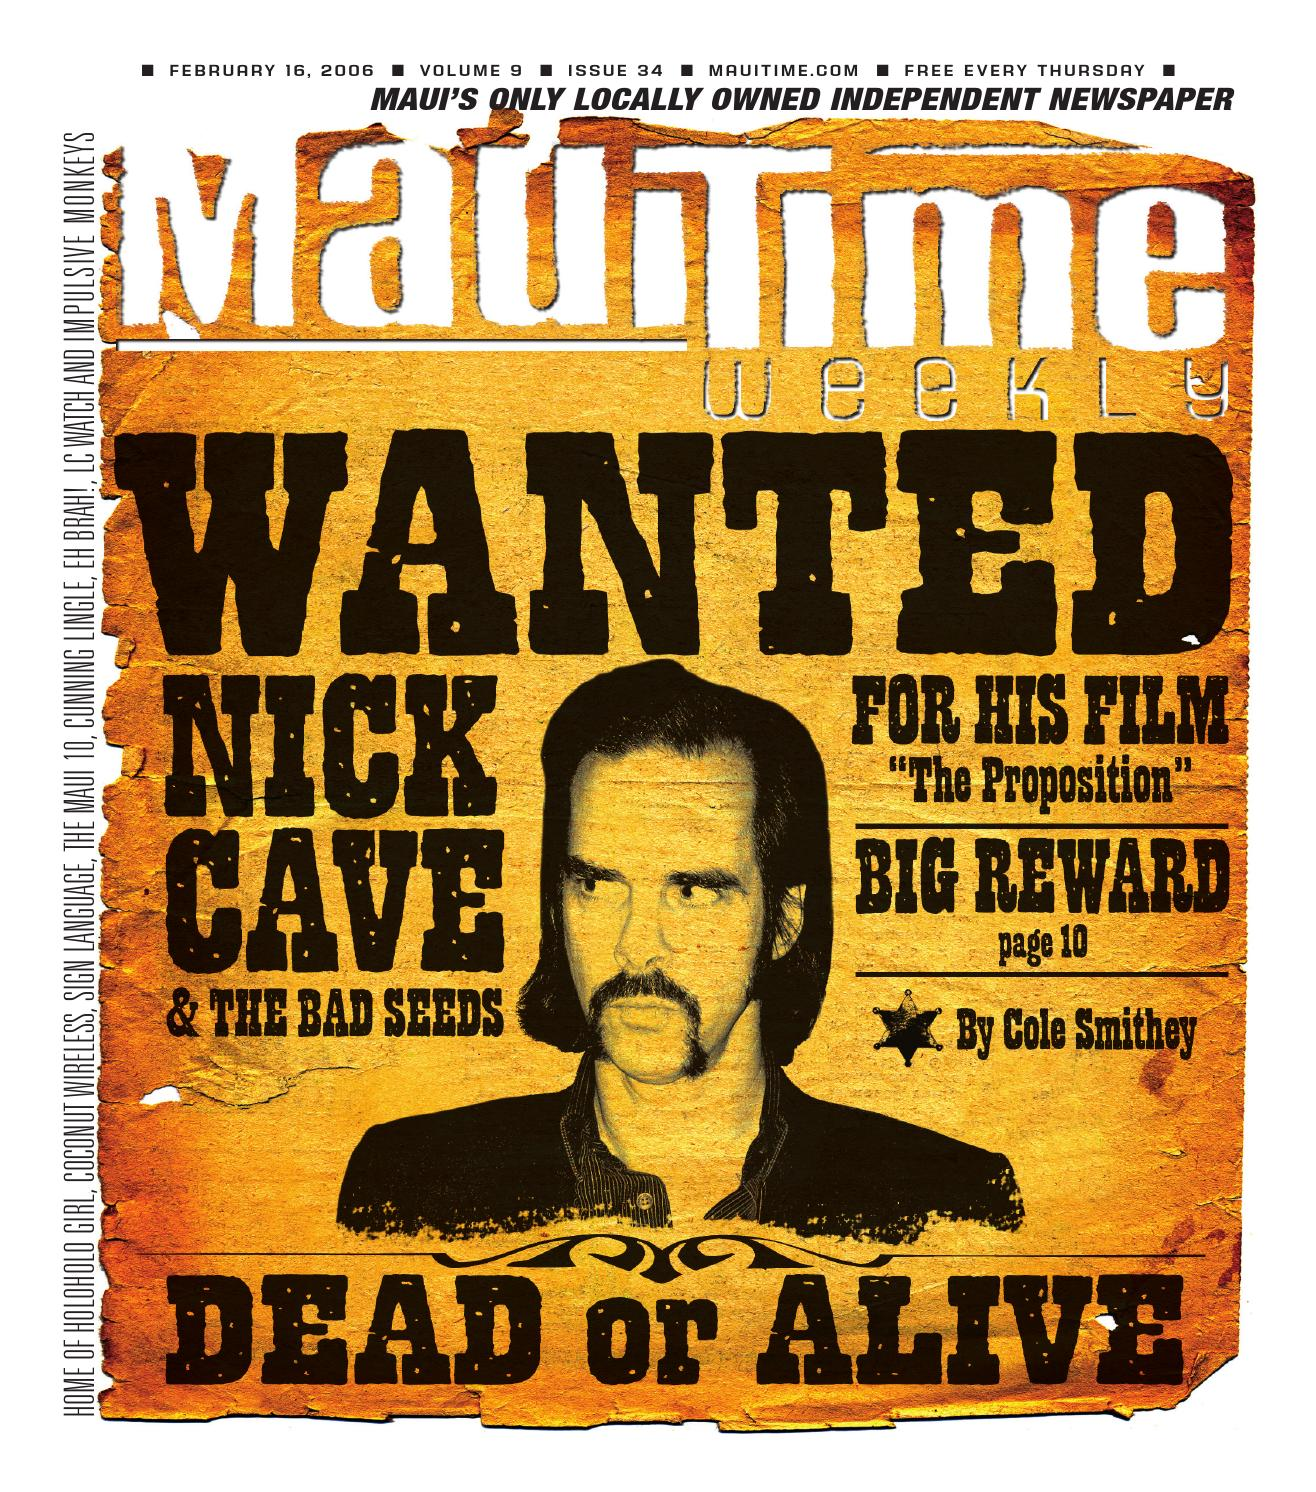 e60c093e053 9.34 Nick Cave Wanted, February 16, 2006, Volume 9, Issue 34, MauiTime by  Maui Time - issuu